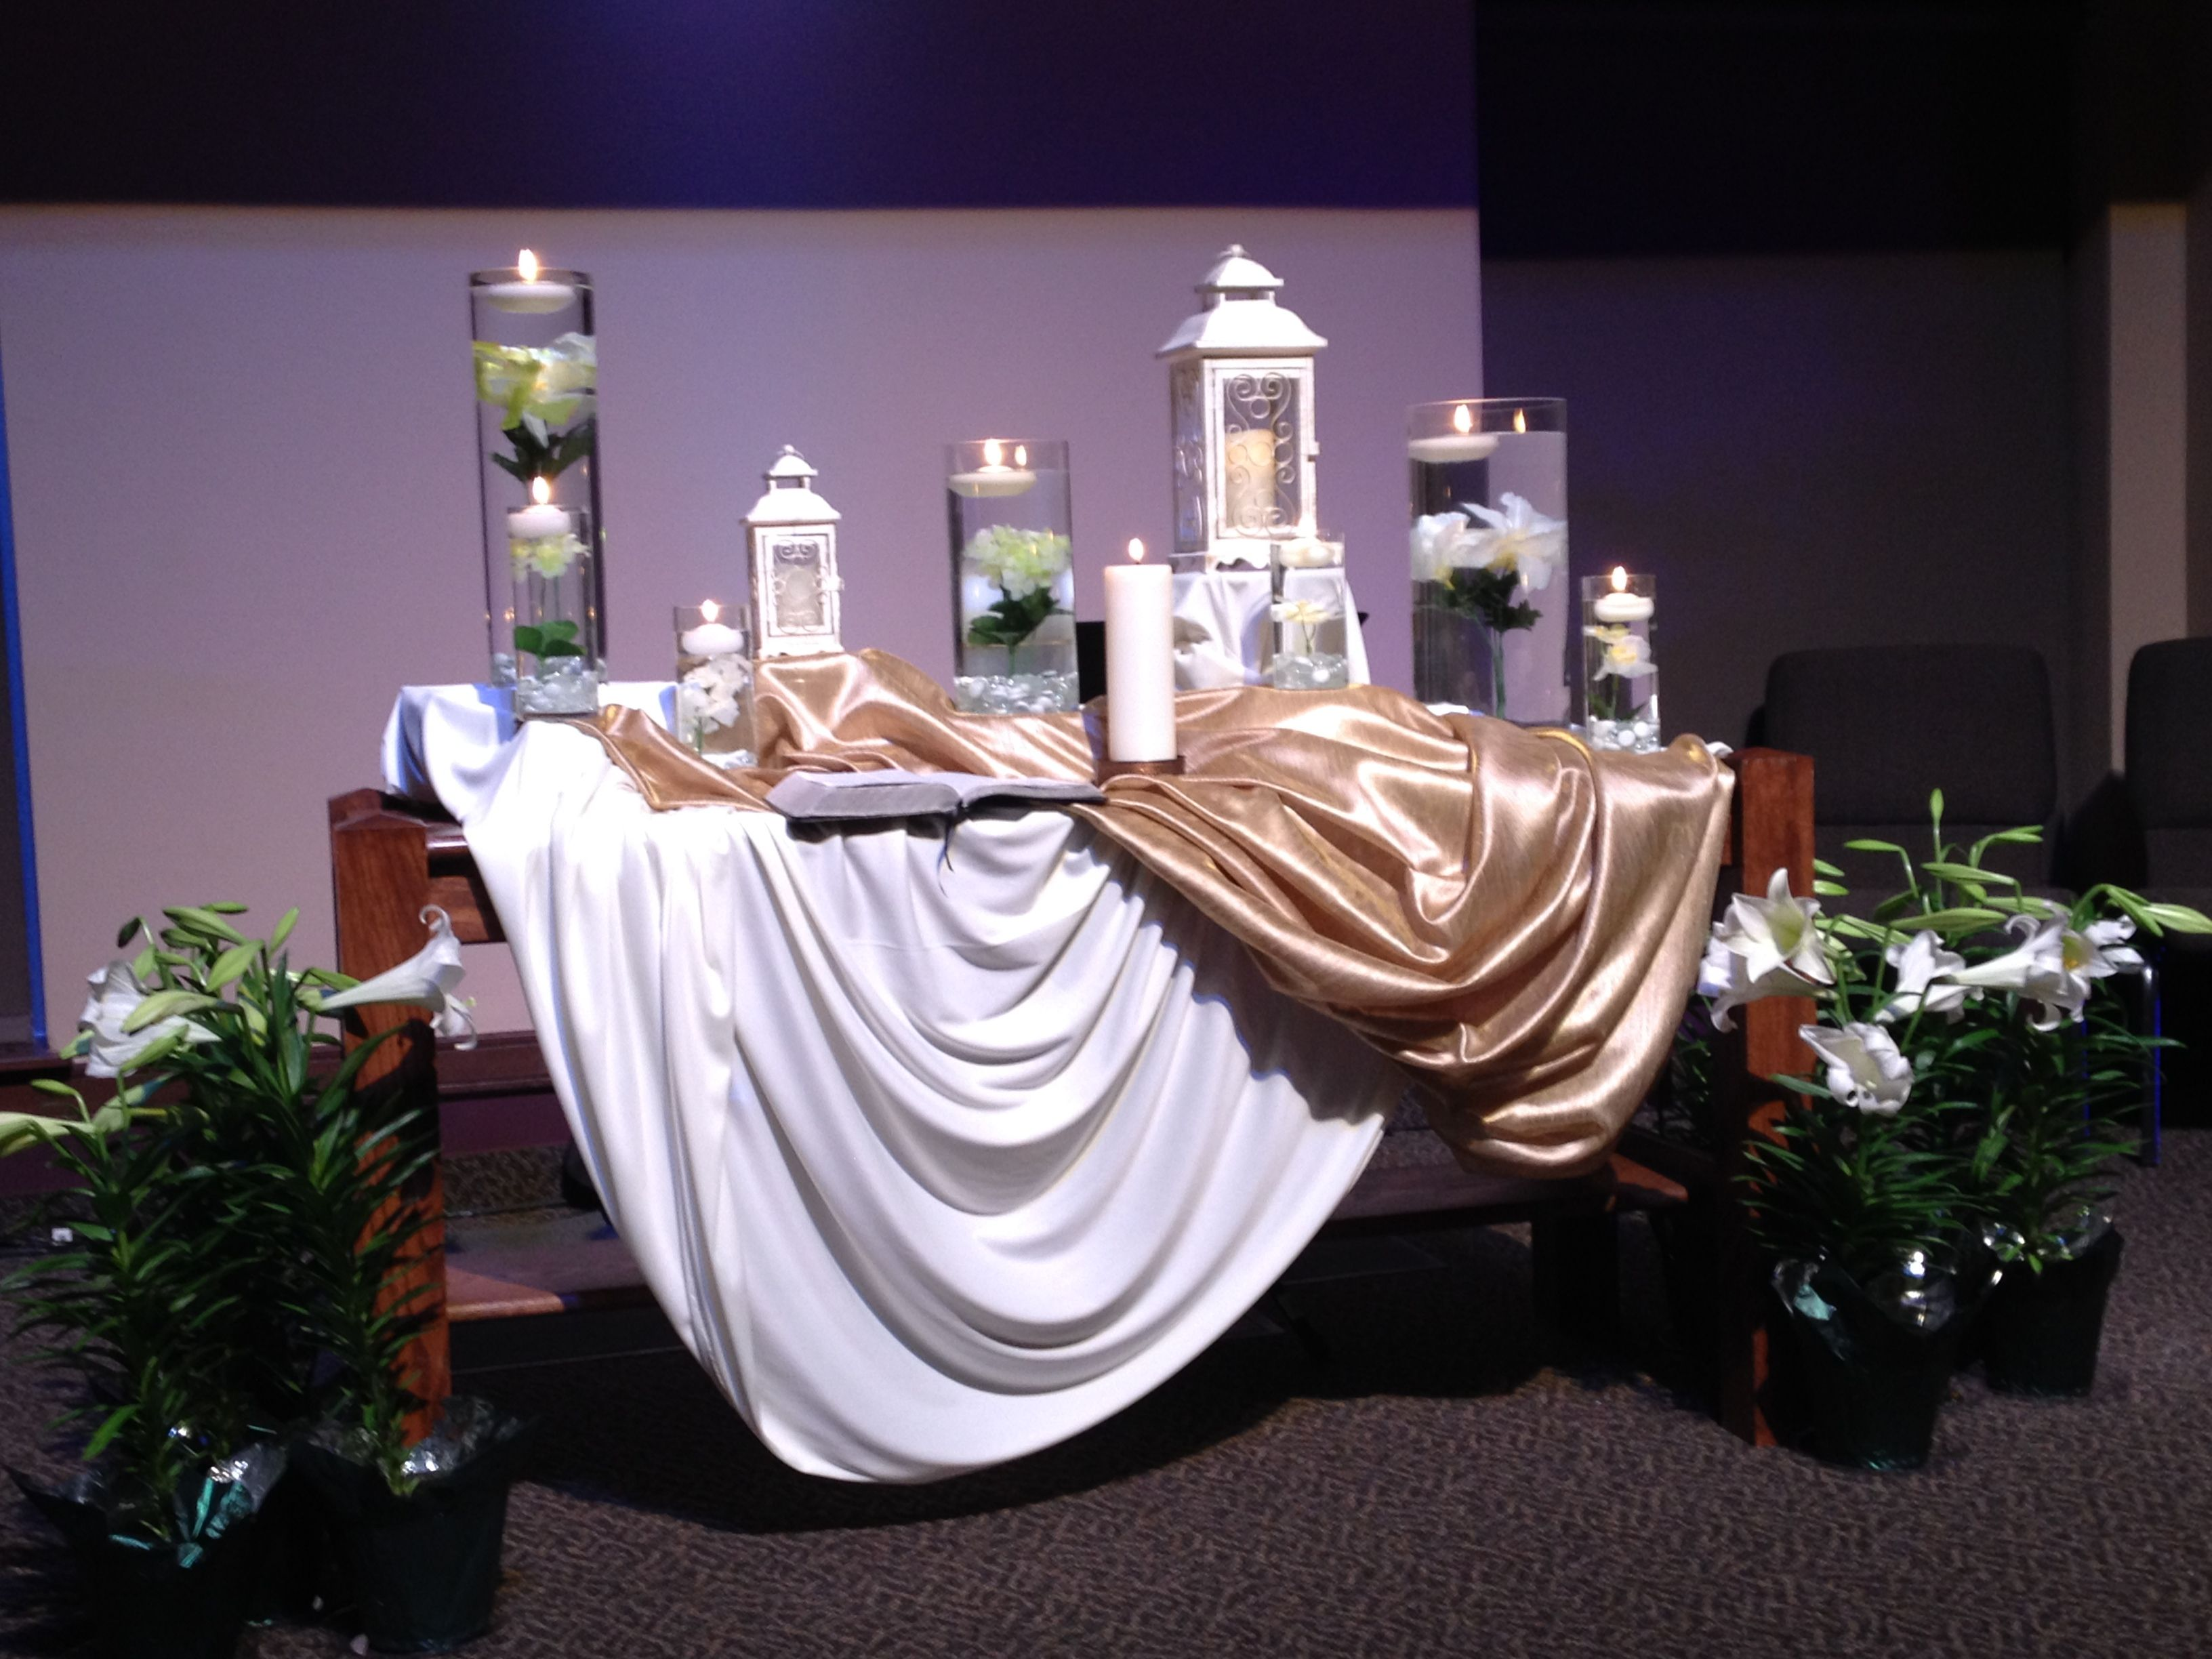 Delightful Grace Avenue United Methodist Church, Frisco TX. 2014 Easter Altar In  Worship Center